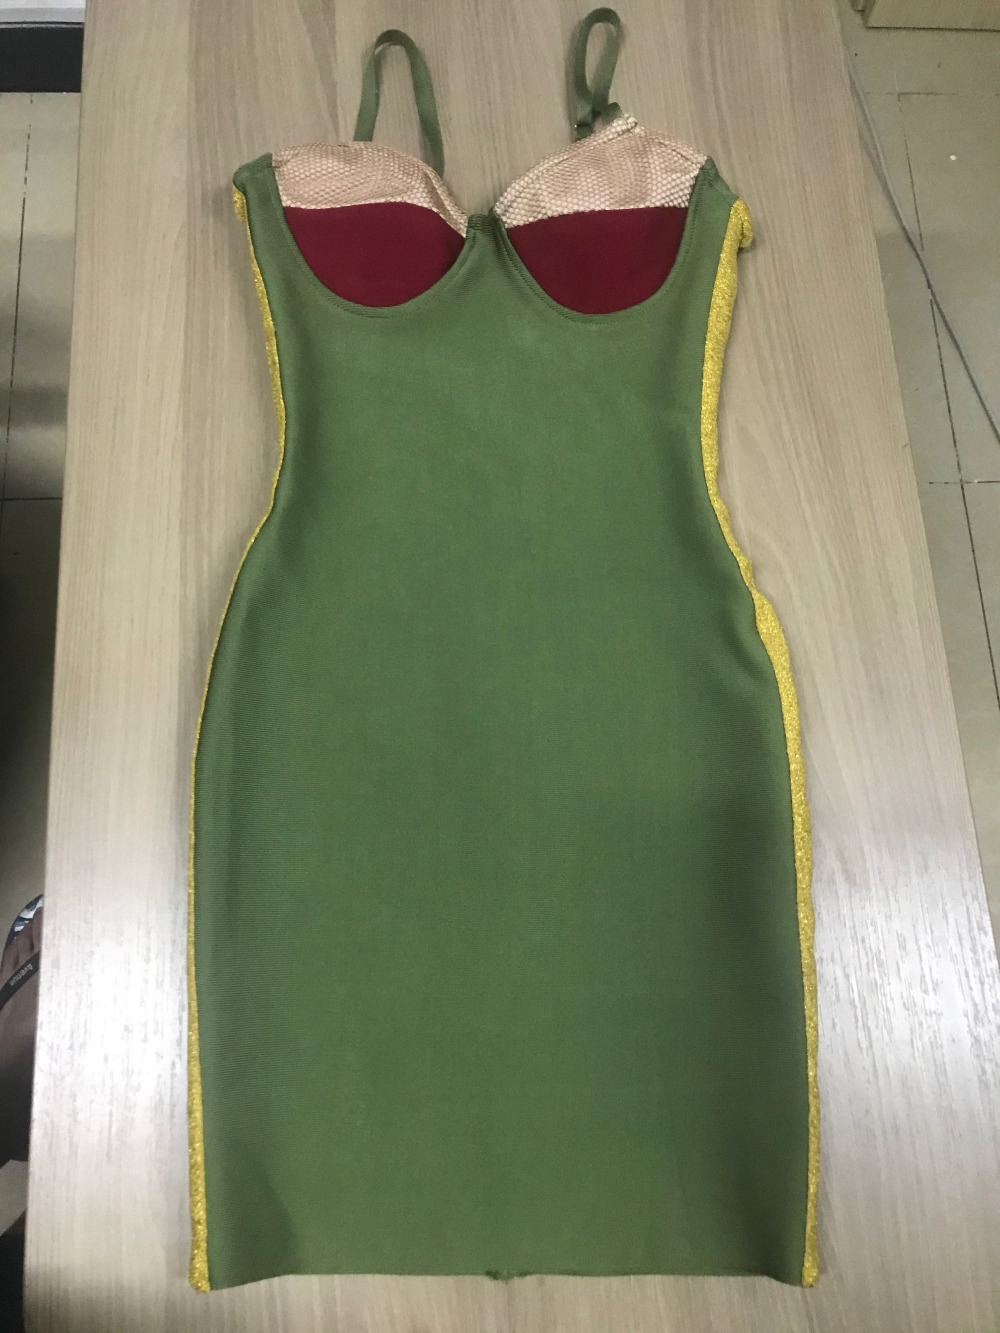 Kim Kardashian High Quality Vintage Green Colorblock Khaki Burgundy Bra-style Neckline Bustier Bodycon Party Dress Vestidos - kim-kardashian-outfits-dresses